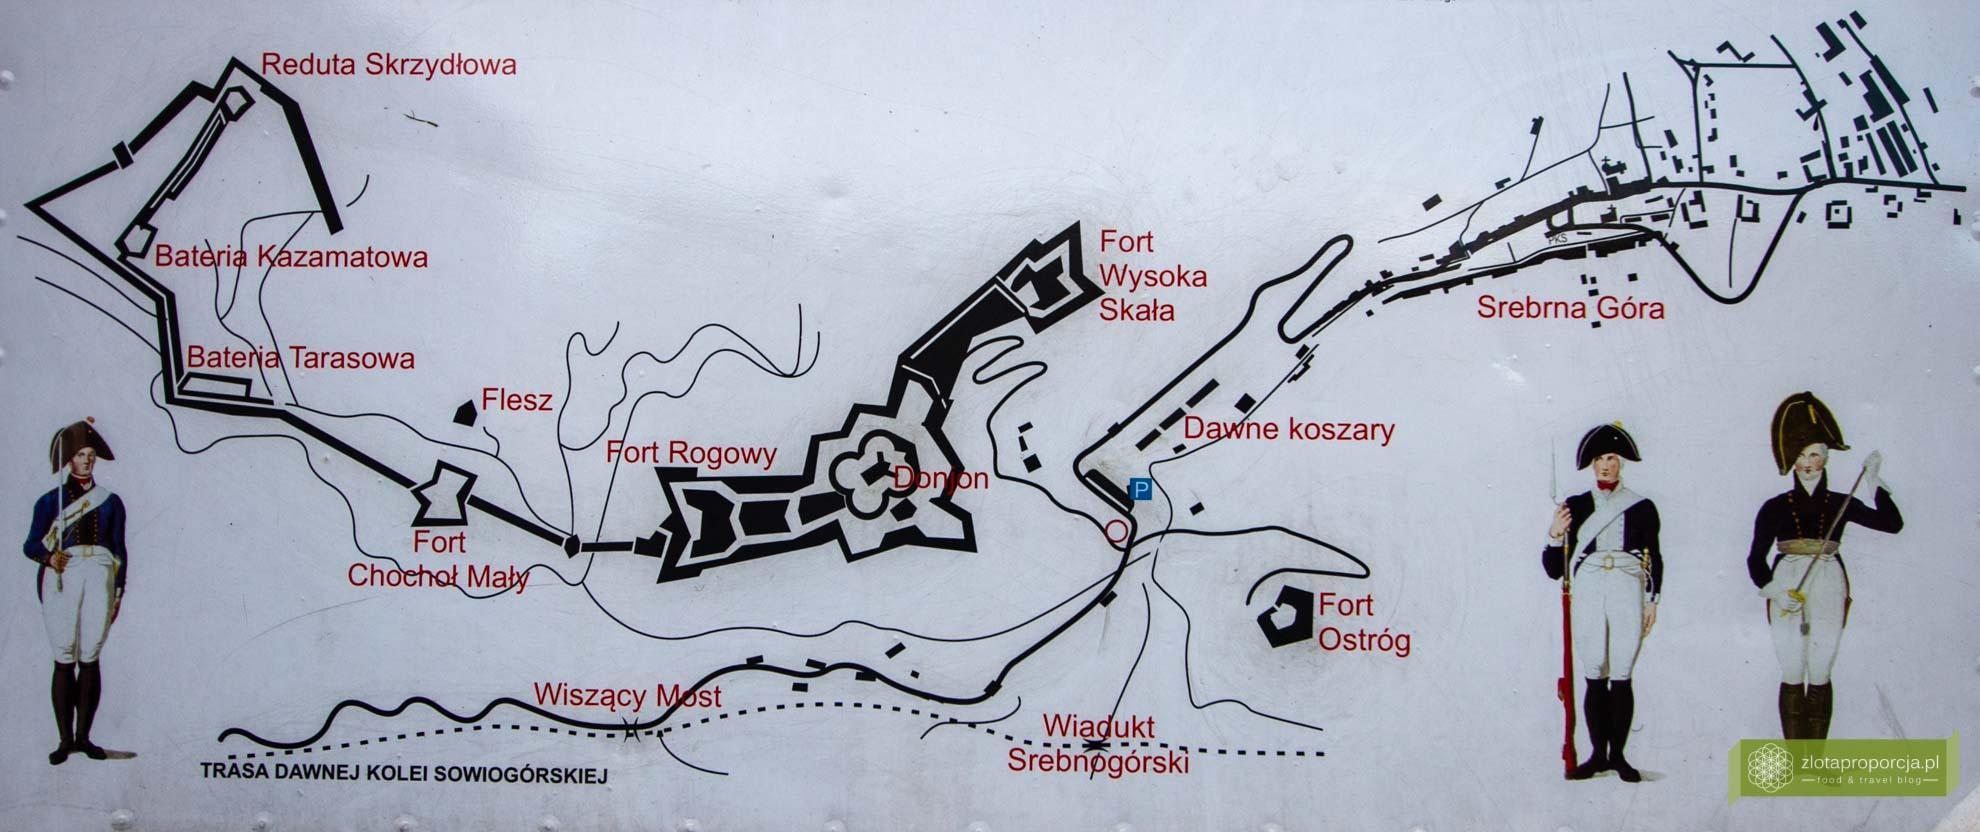 Srebrna Góra, twierdza Srebrna Góra; plan twierdzy Srebrna Góra